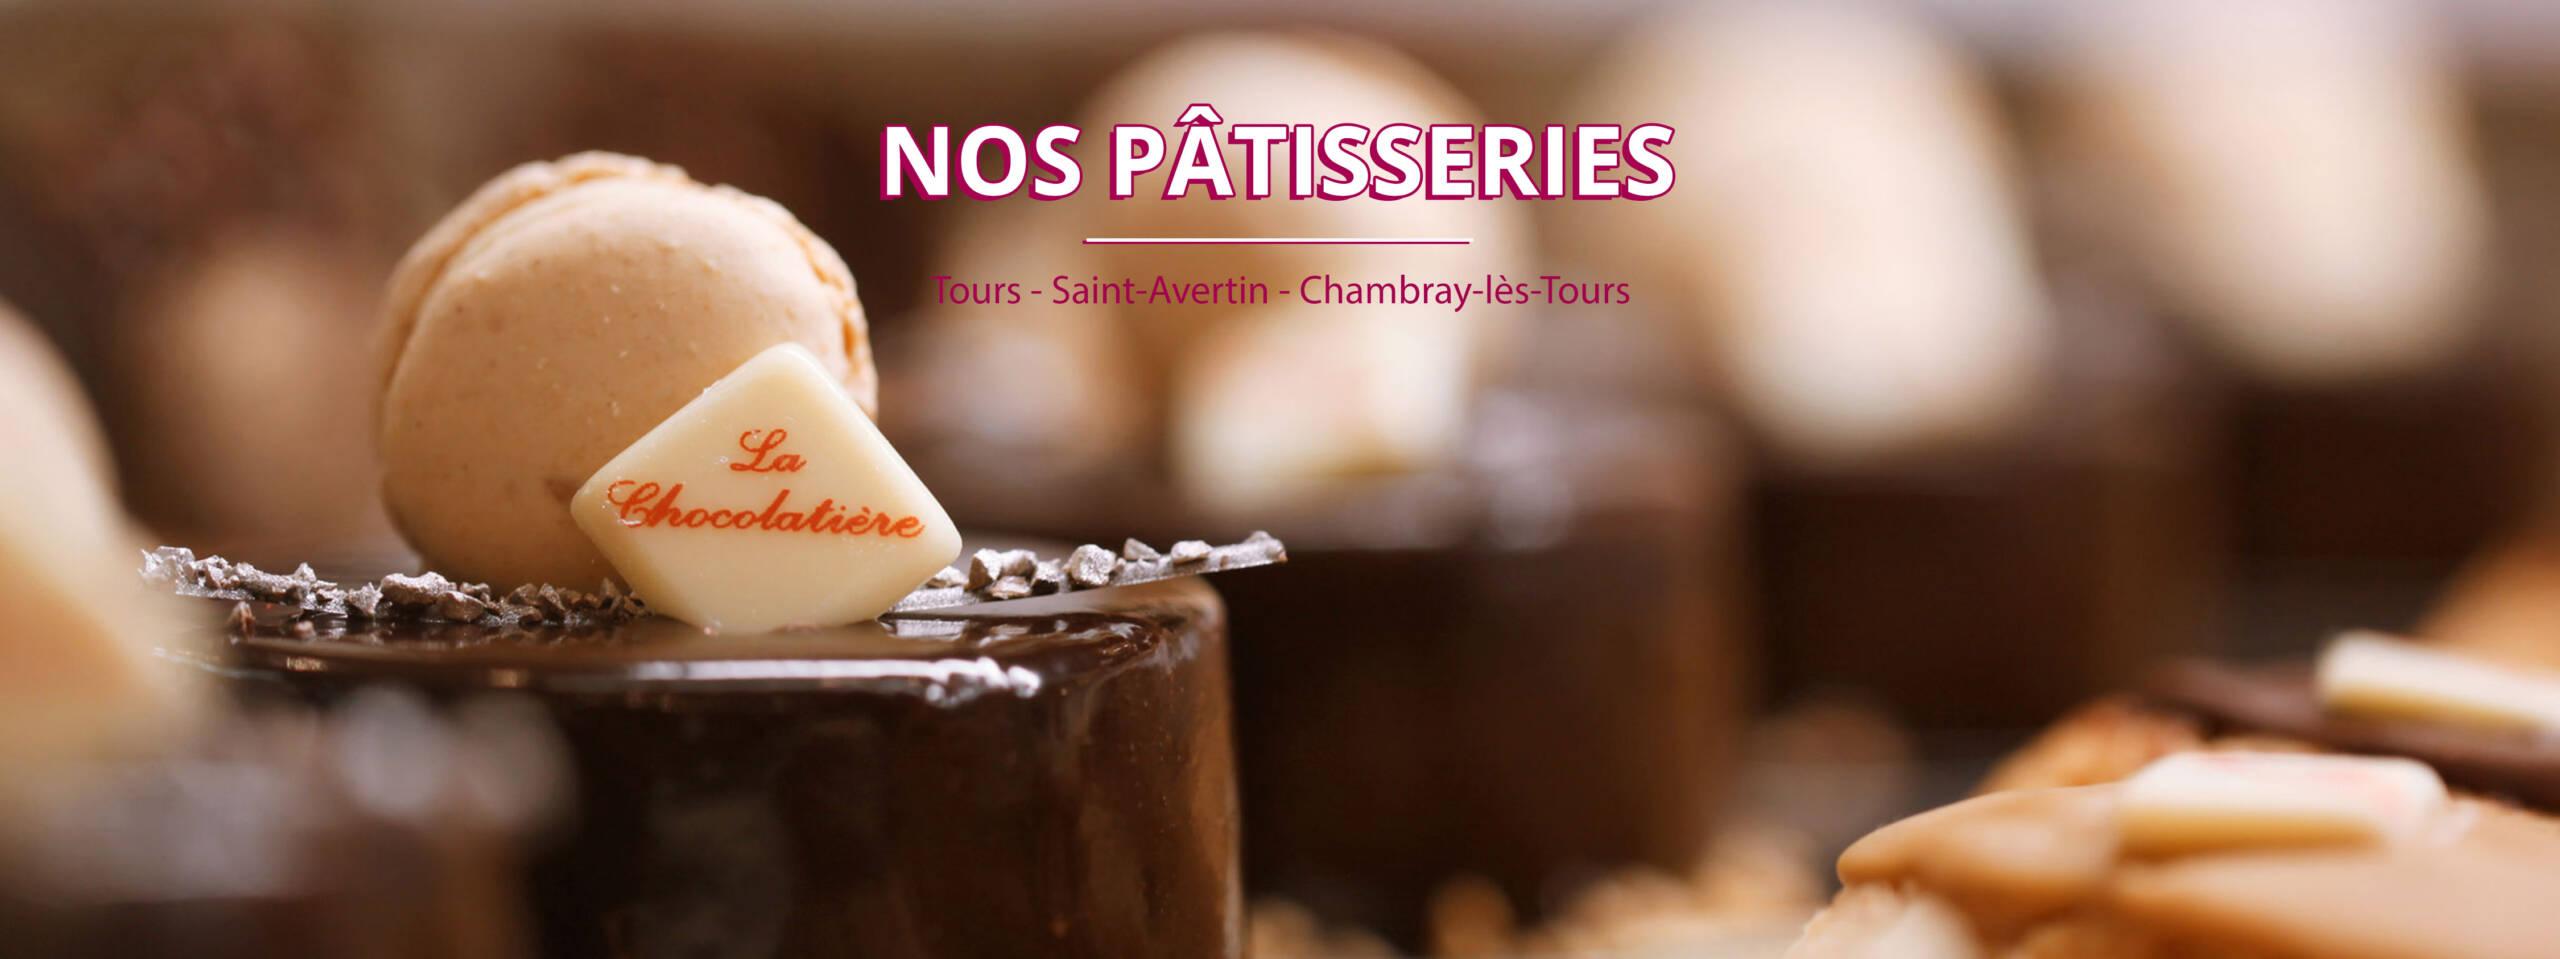 Pâtisseries La Chocolatière